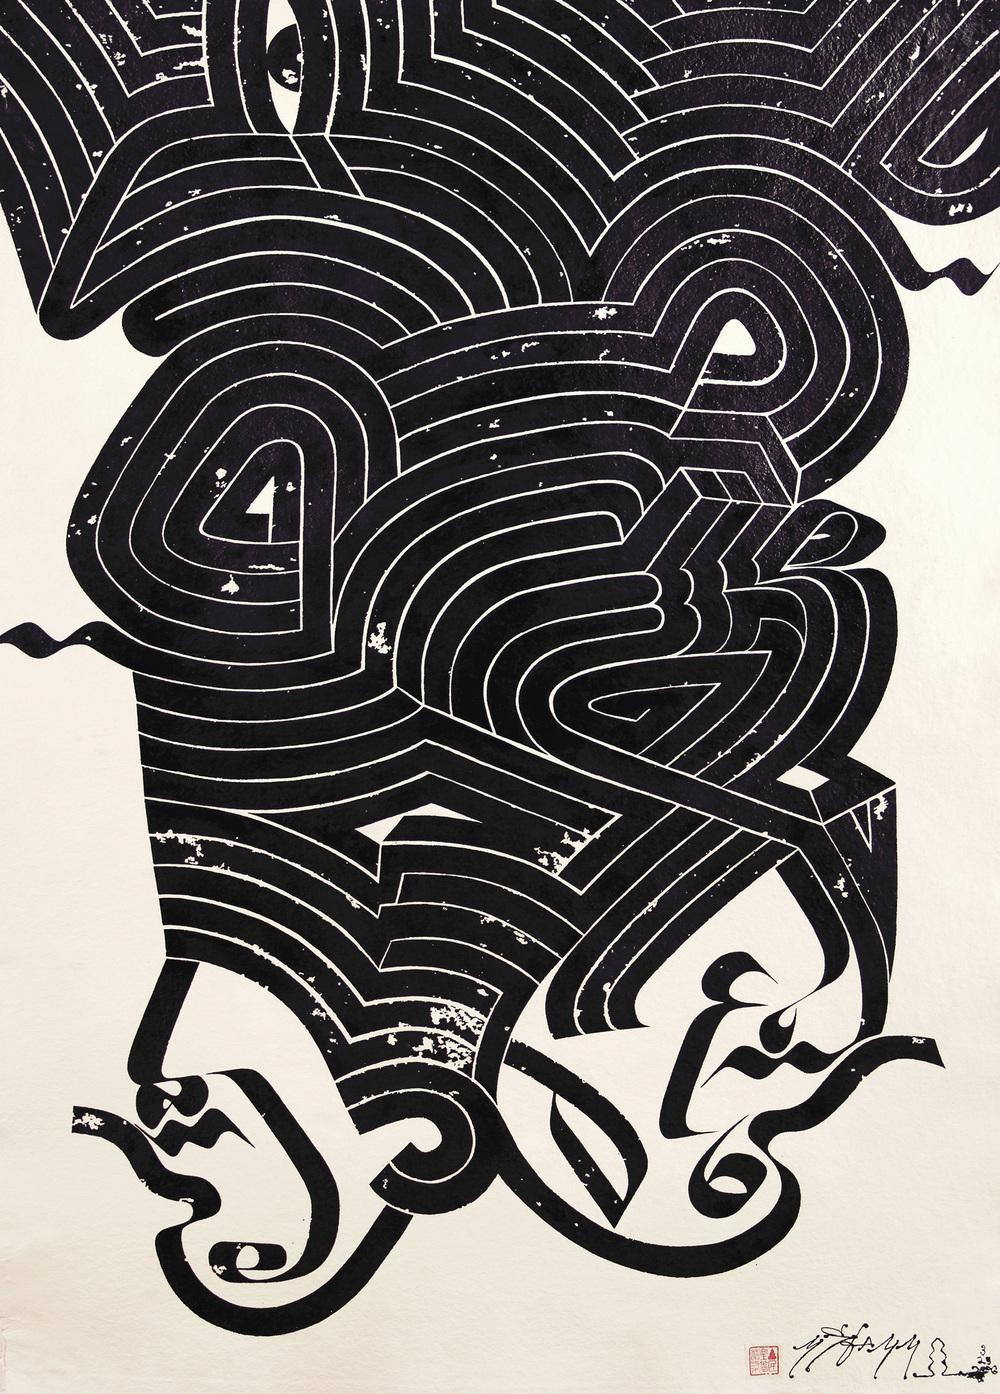 Siamese Antichrist, 2006 sumi ink on handmade paper 52 x 36 inch